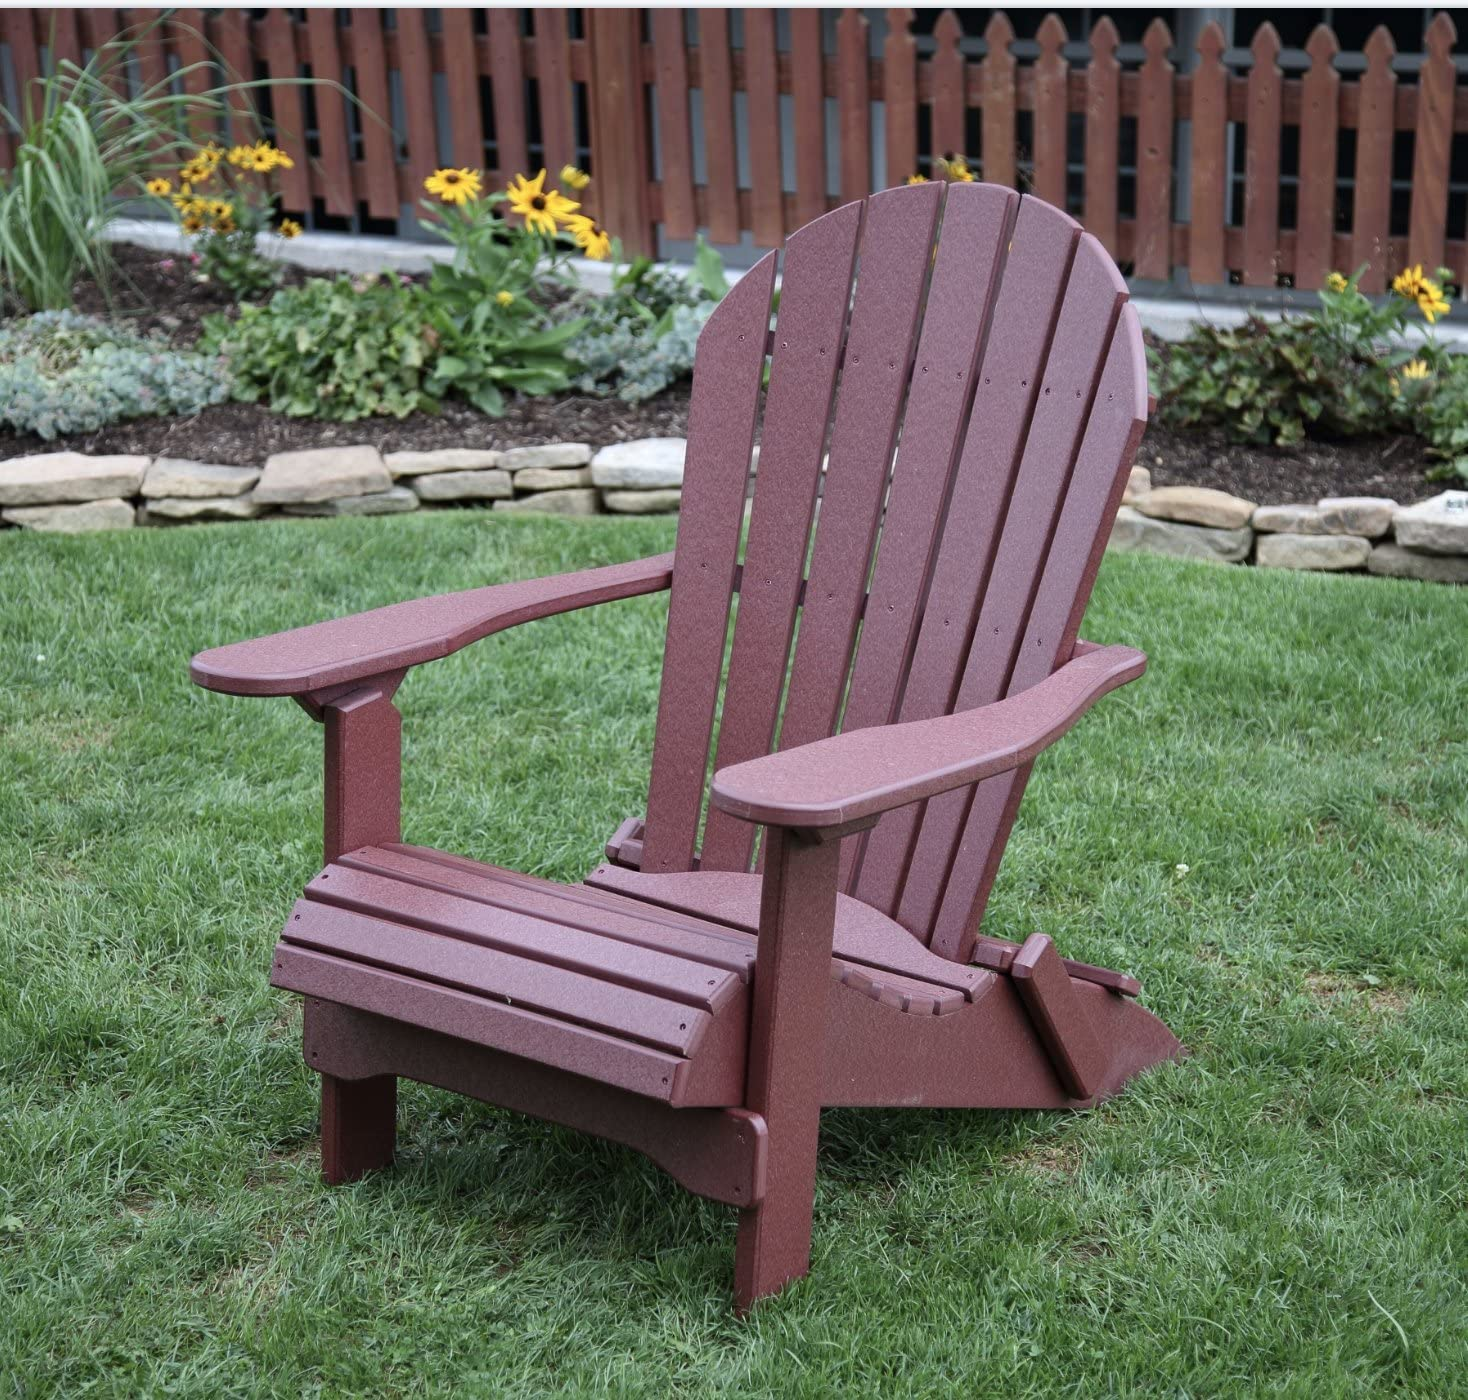 Cherrywood-Poly Lumber Folding Adirondack Chair